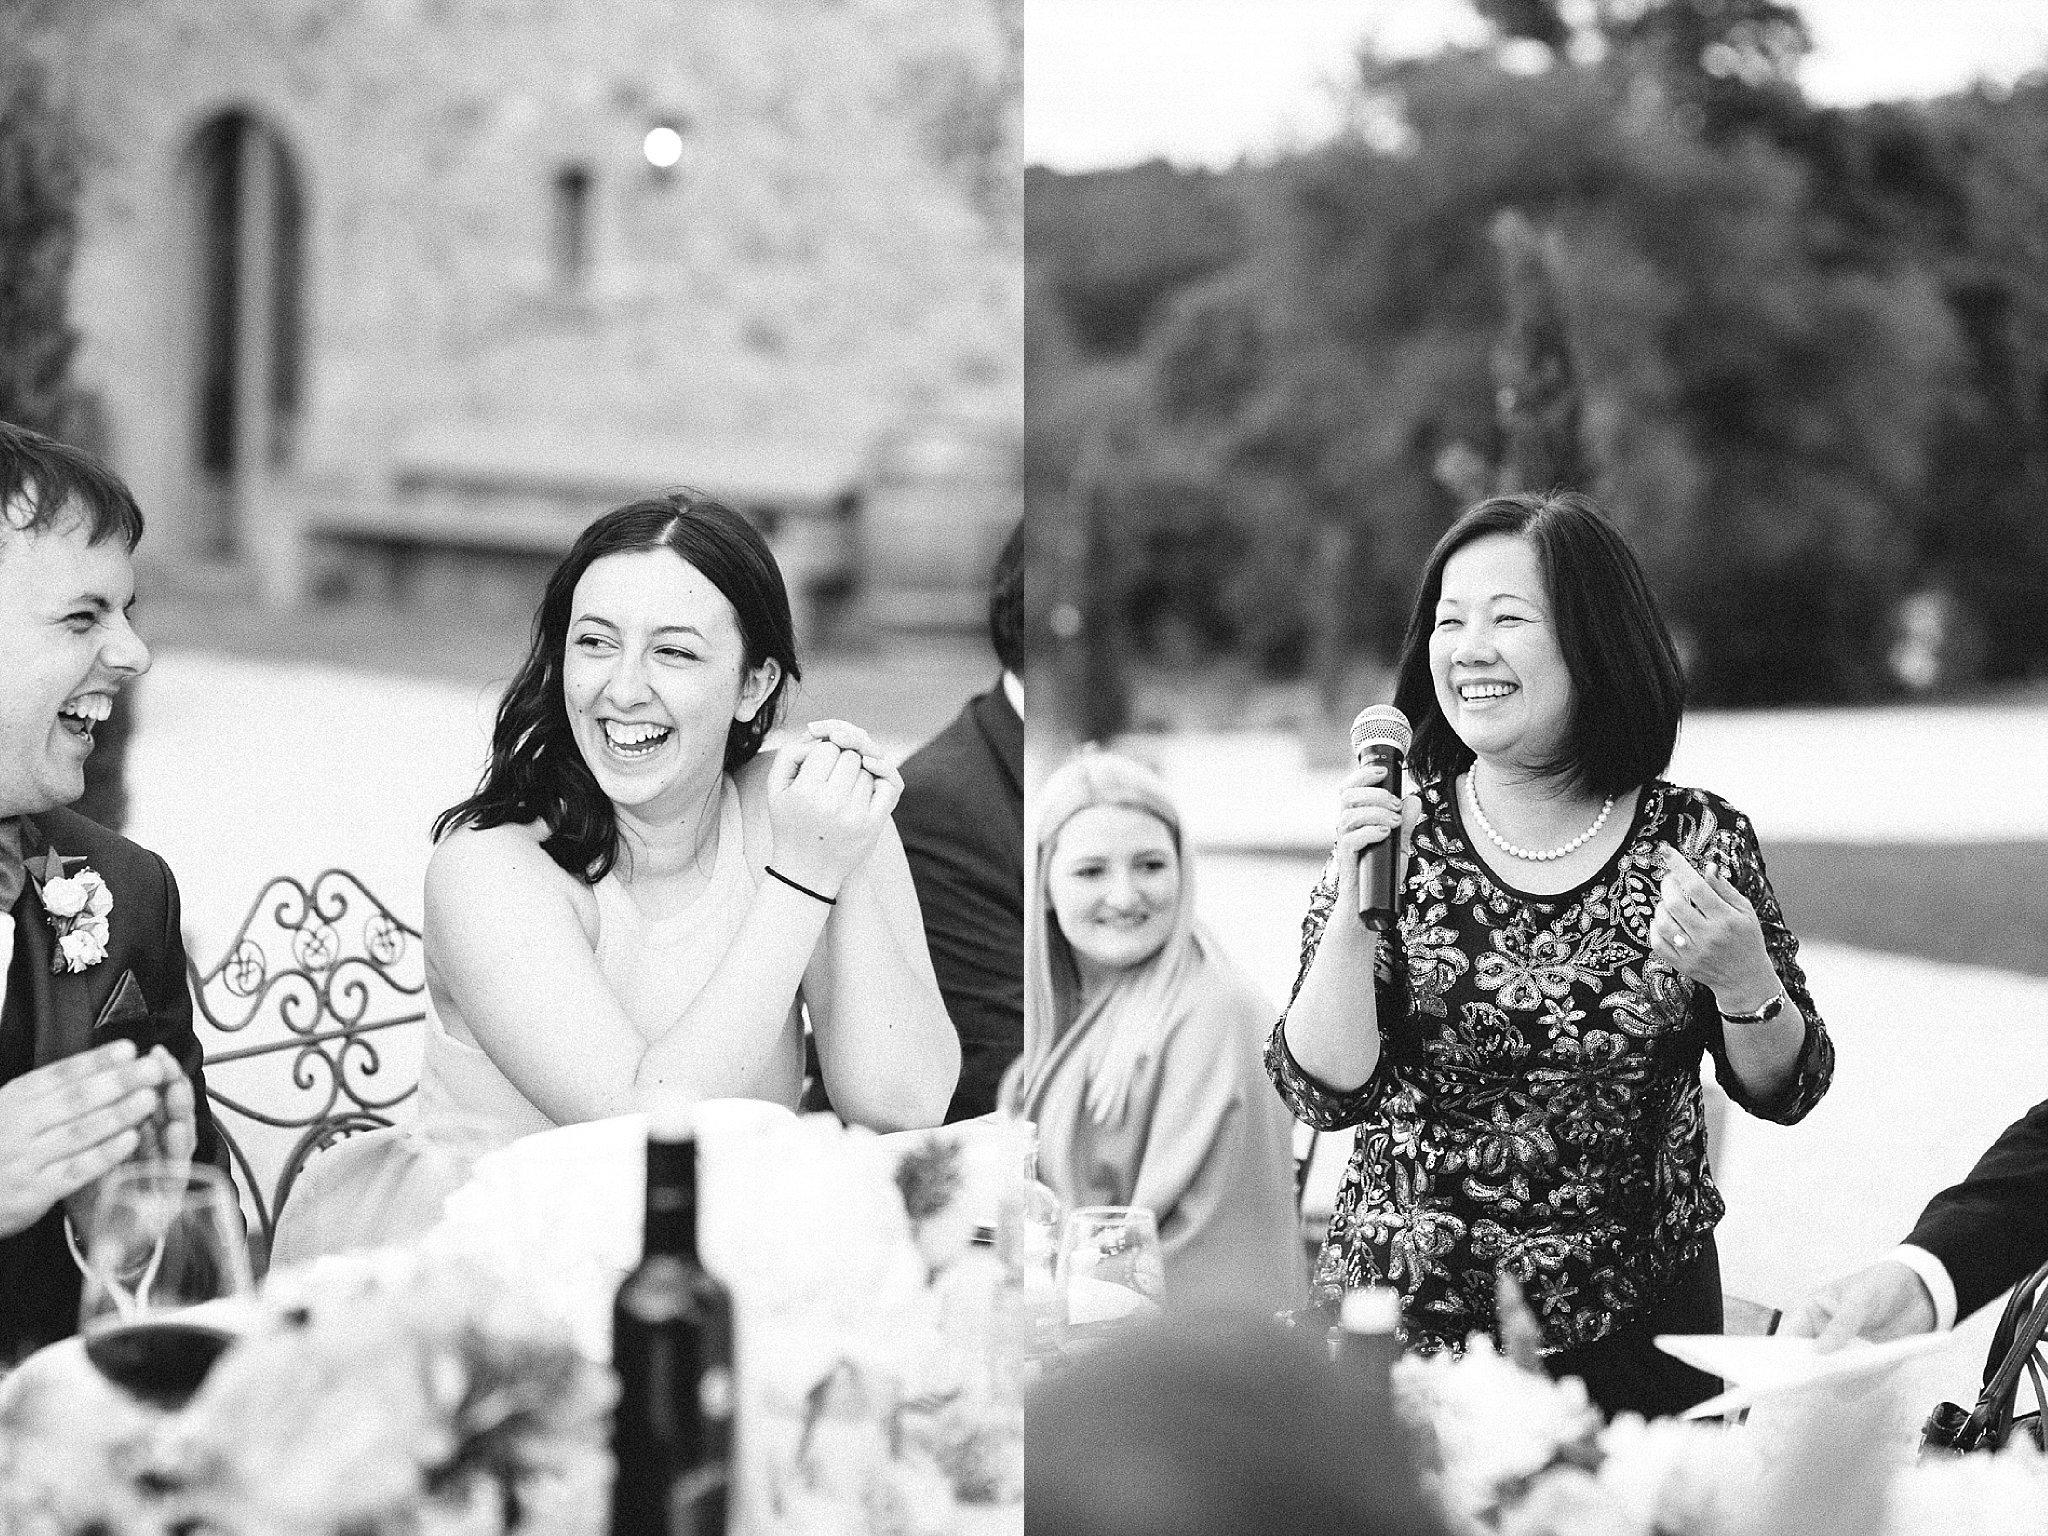 Conti di San Bonifacio Wedding,Destination Wedding Photographer,Fine Art Wedding Photographer,Italy Wedding,Kylee Yee,Kylee Yee Photography,London Wedding Photographer,Tuscany Fine Art Wedding,Tuscany Wedding Photographer,Wedding and Portrait Photographer,